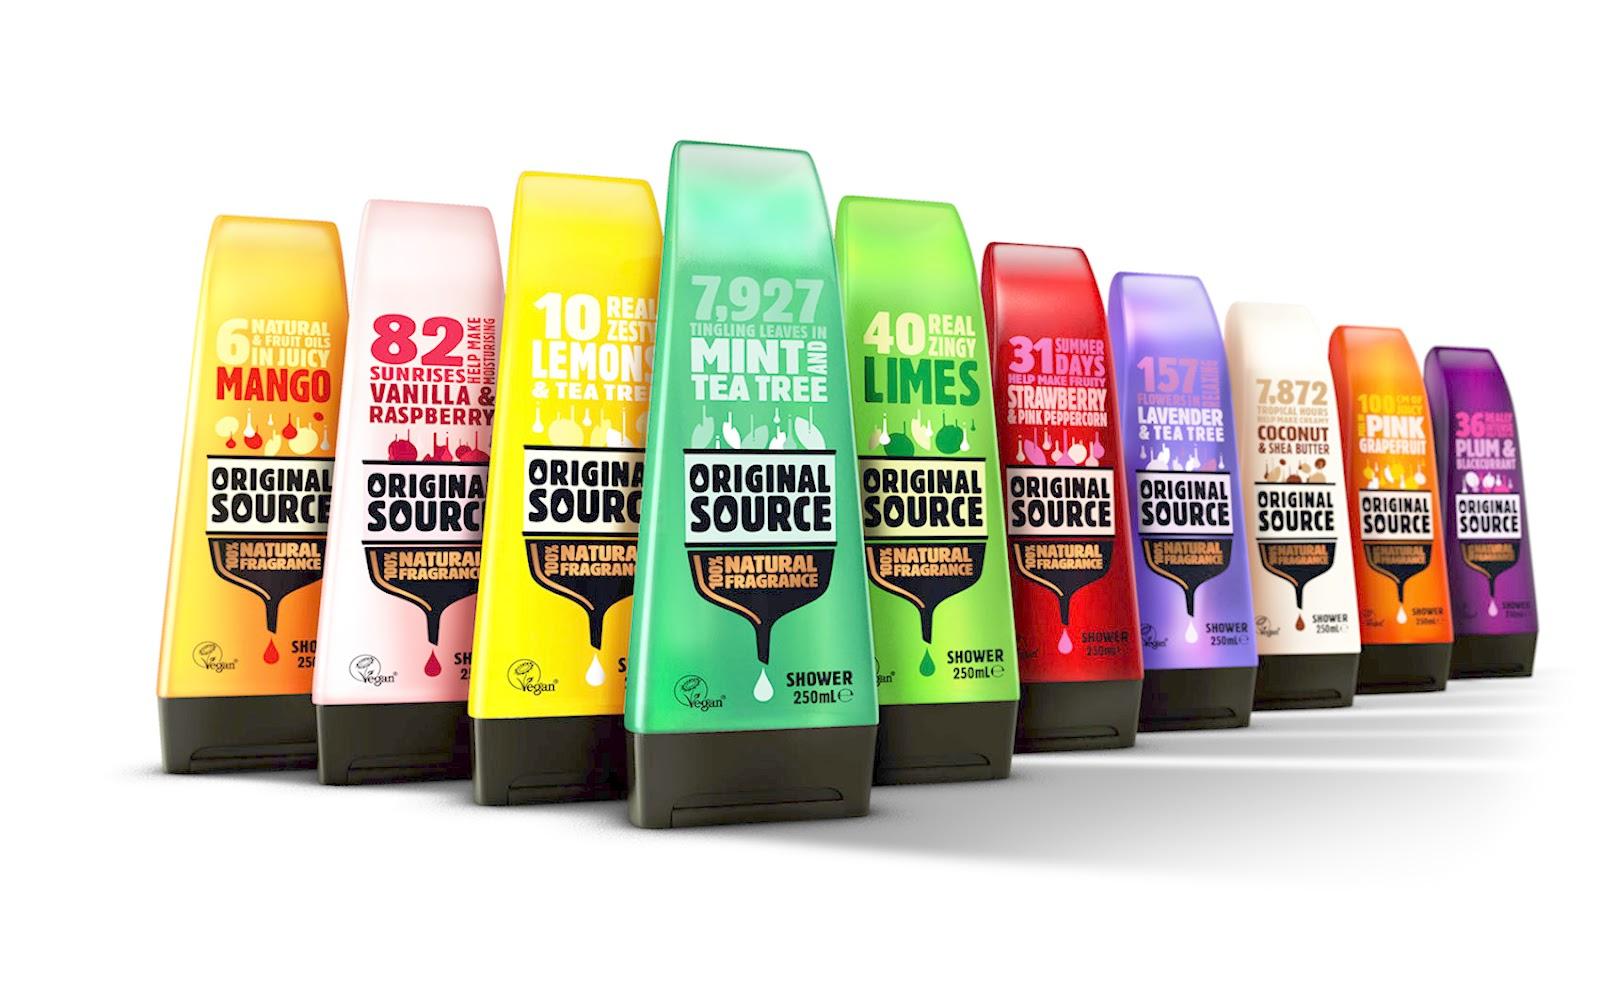 Original Source Shower Range Redesigned On Packaging Of